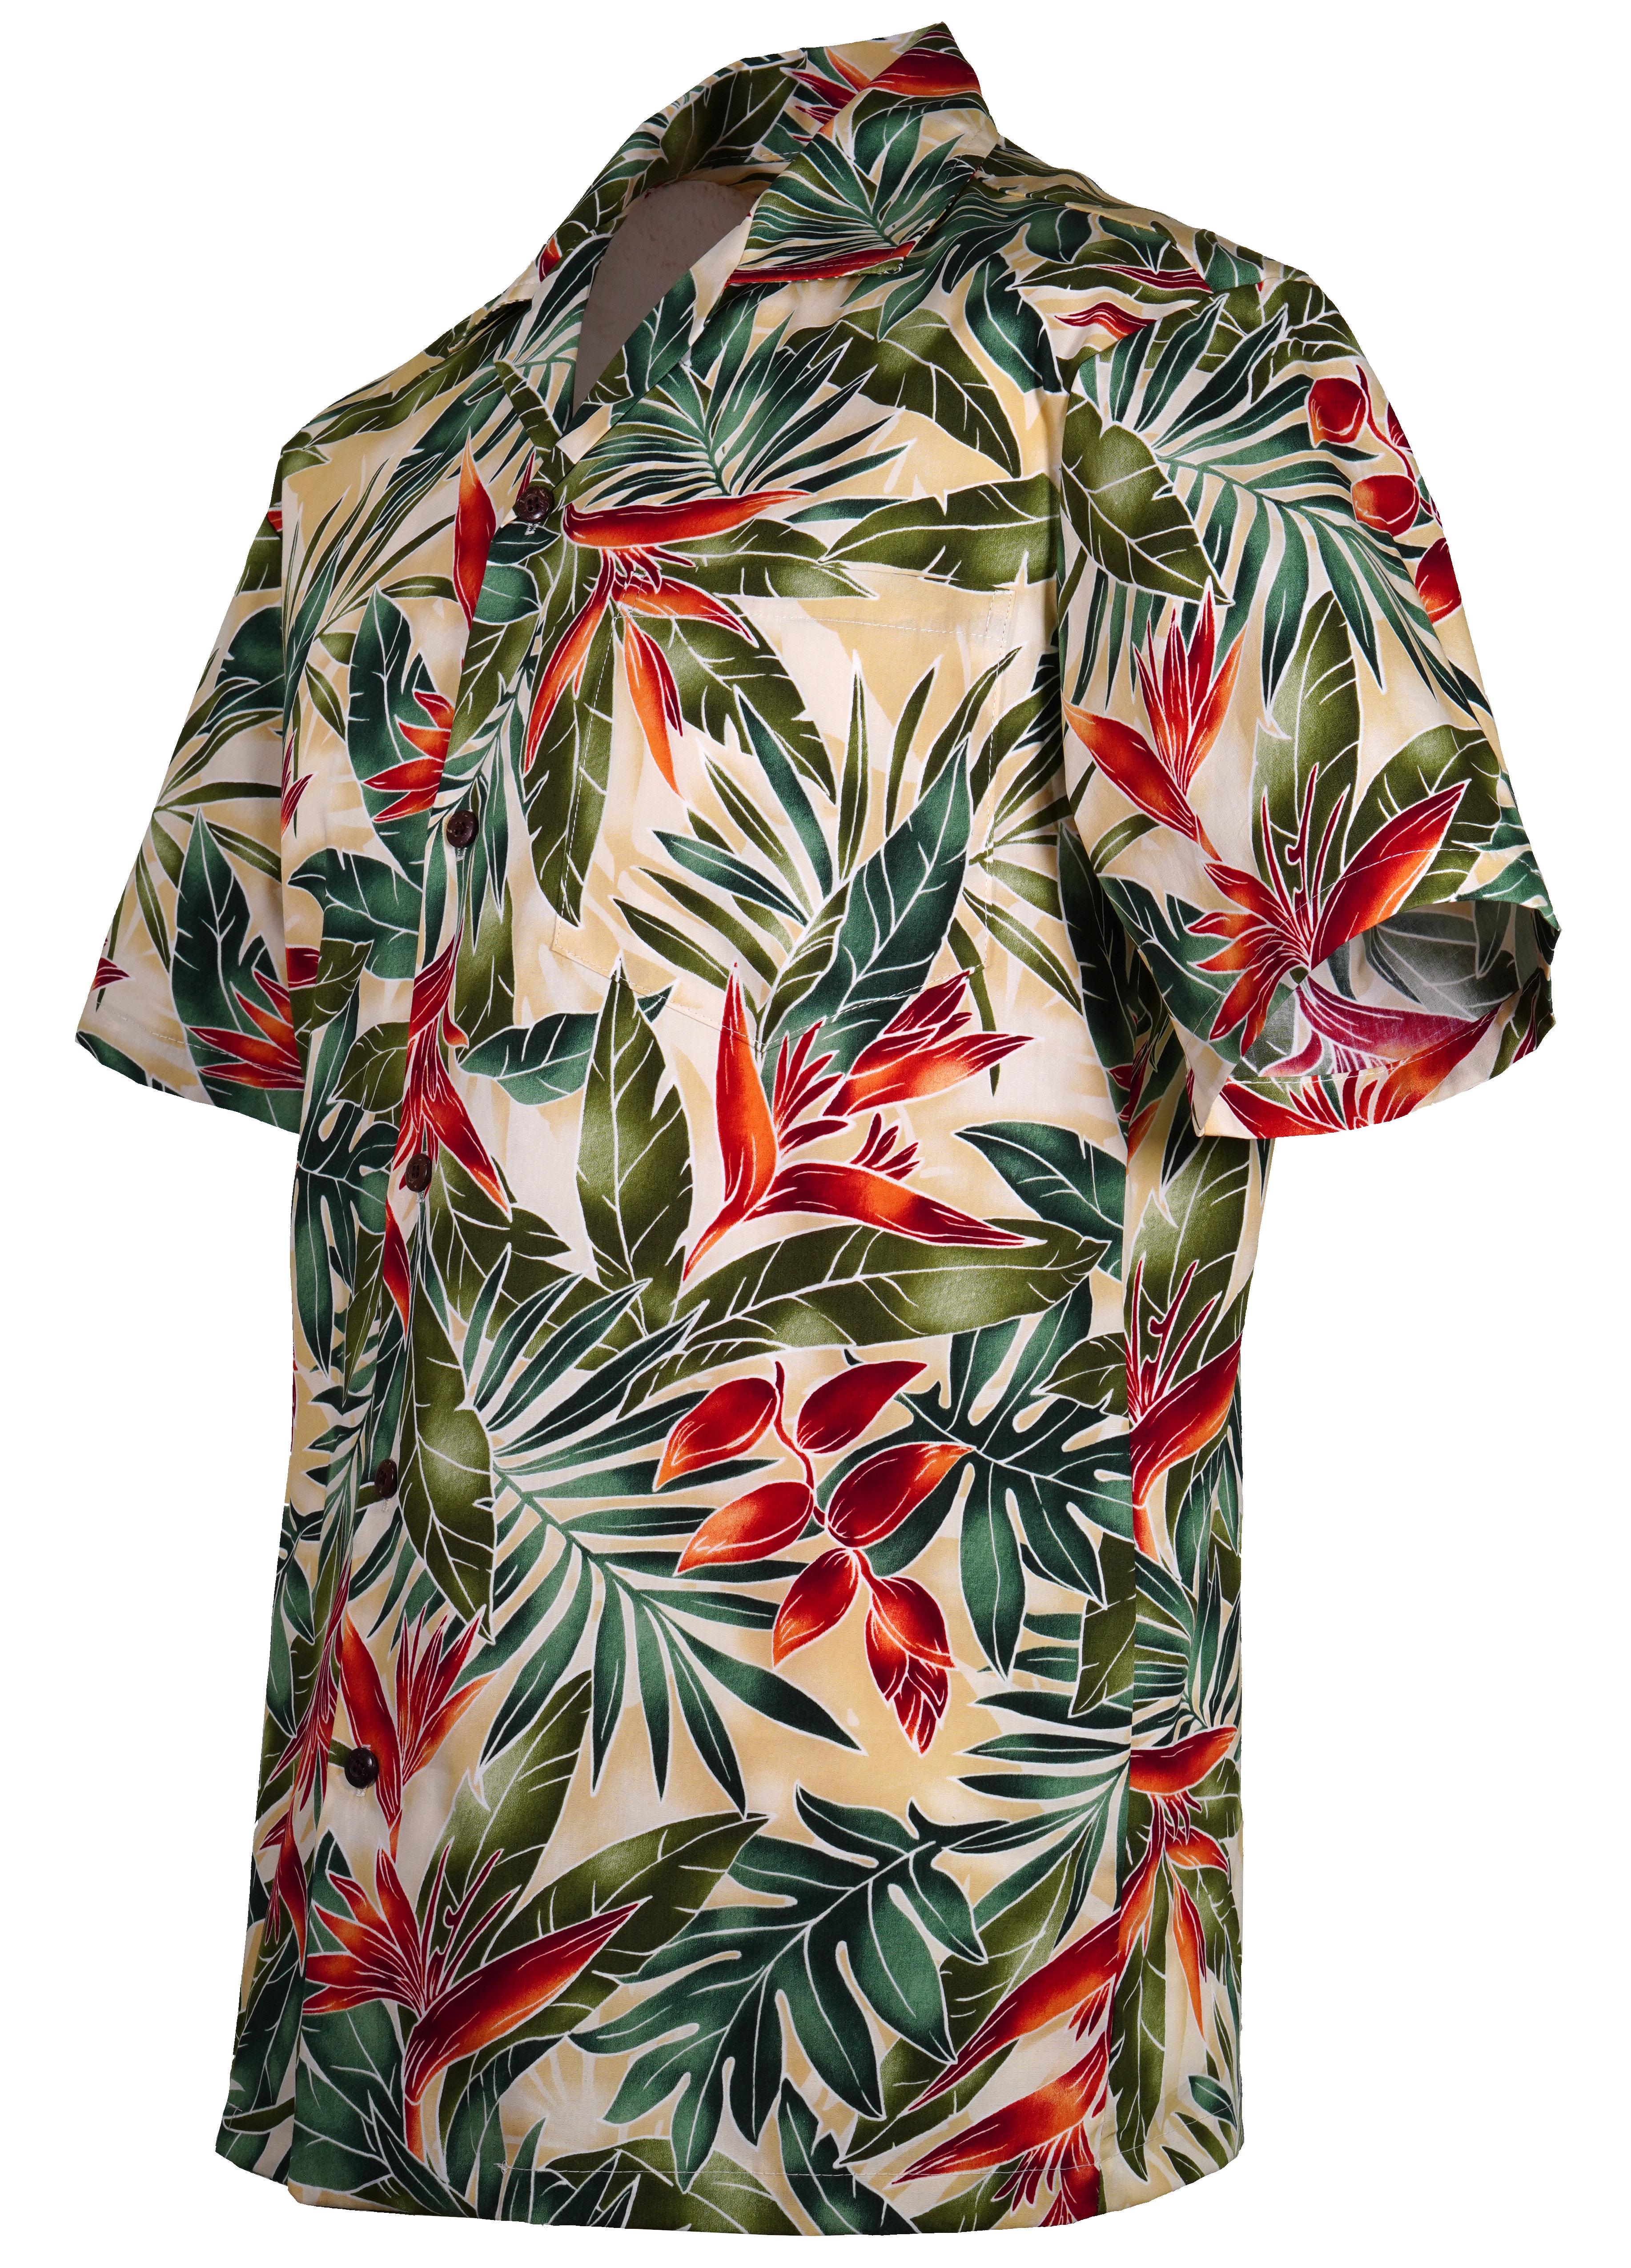 Original Hawaiihemd -NICE&LEAFY-